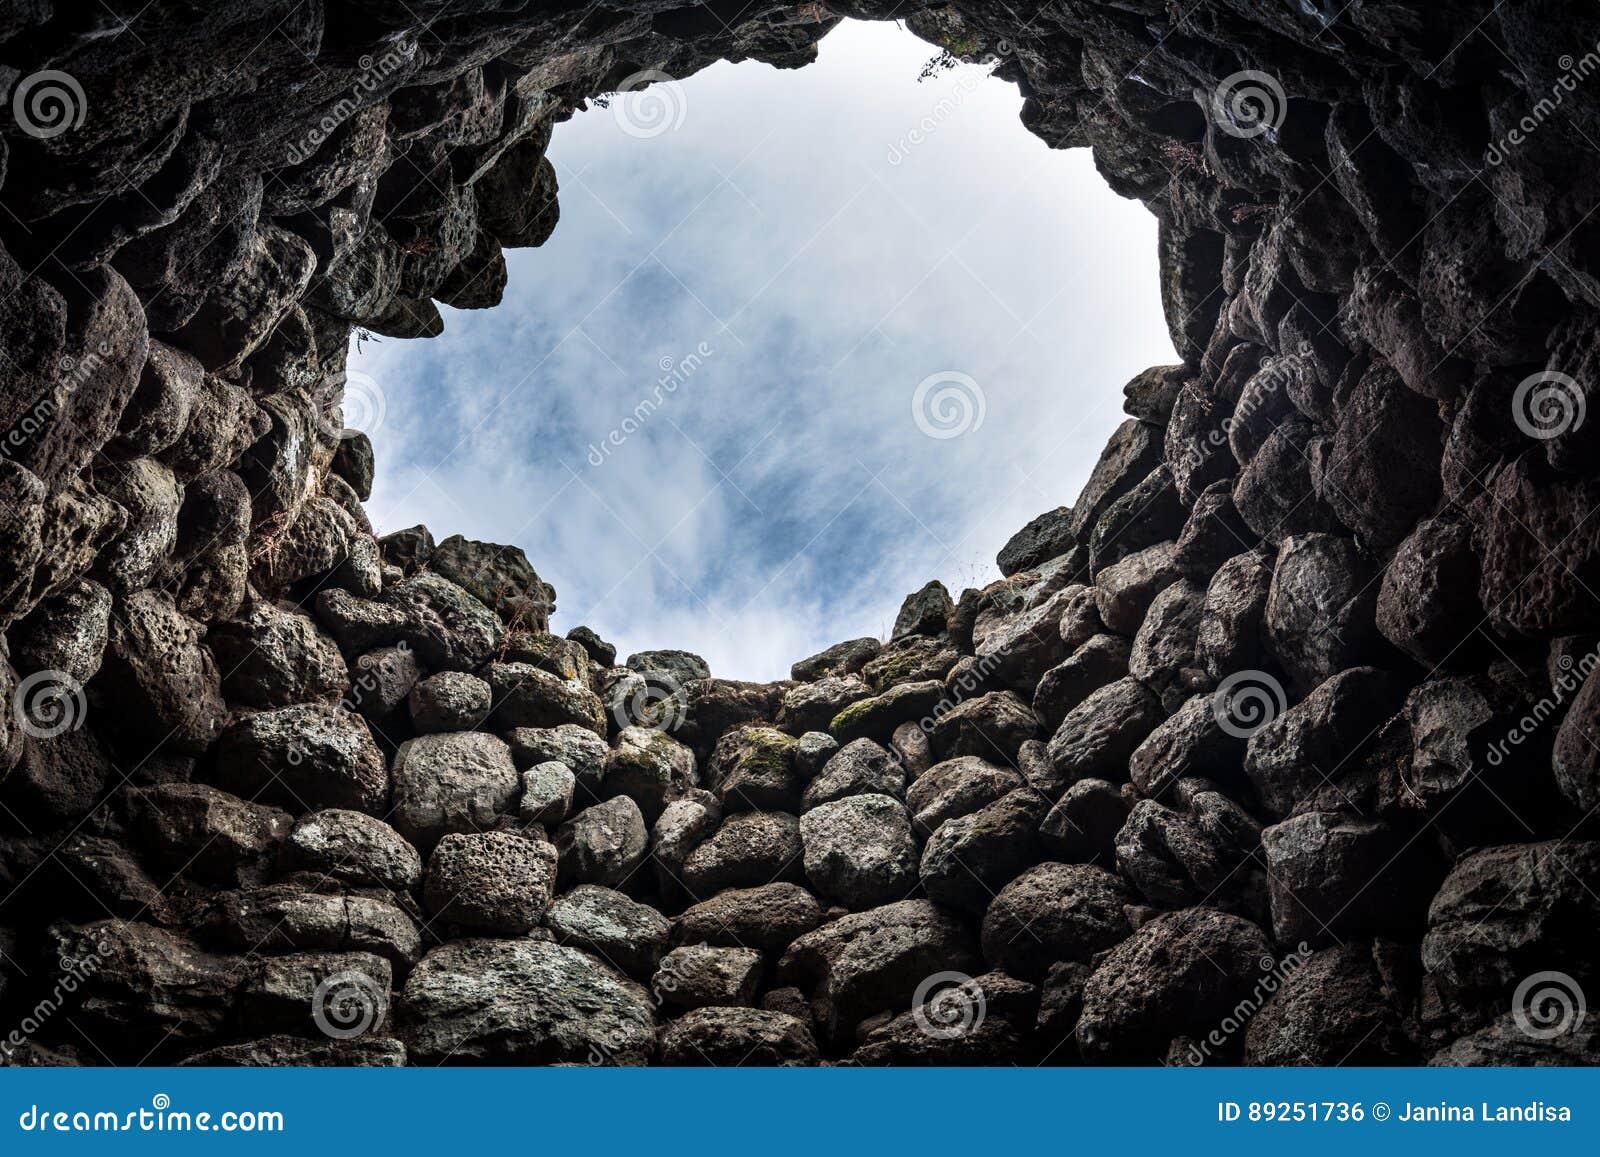 Interior of ancient ruins in Sardinia, Italy.